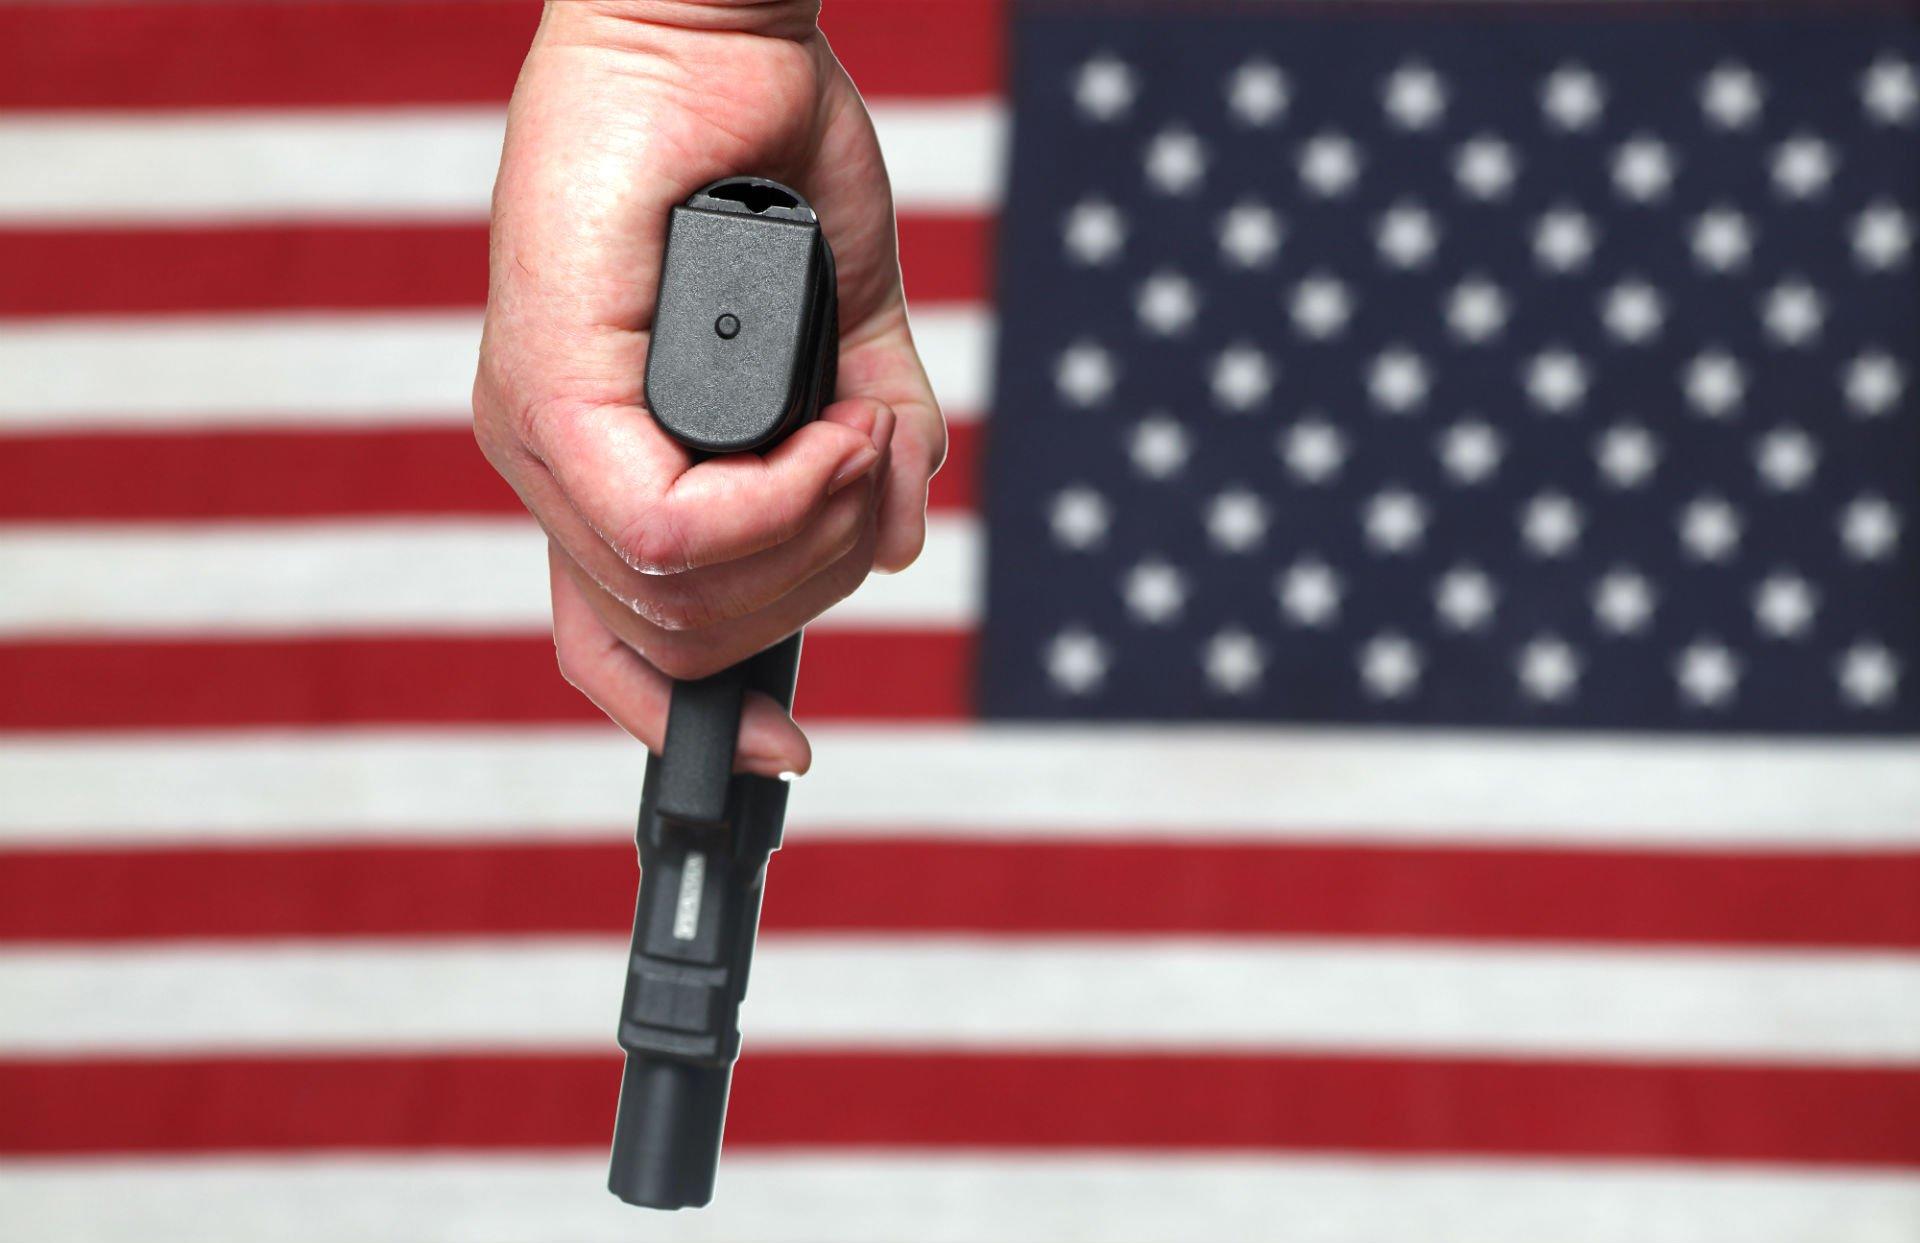 america and guns wallpaper - photo #32